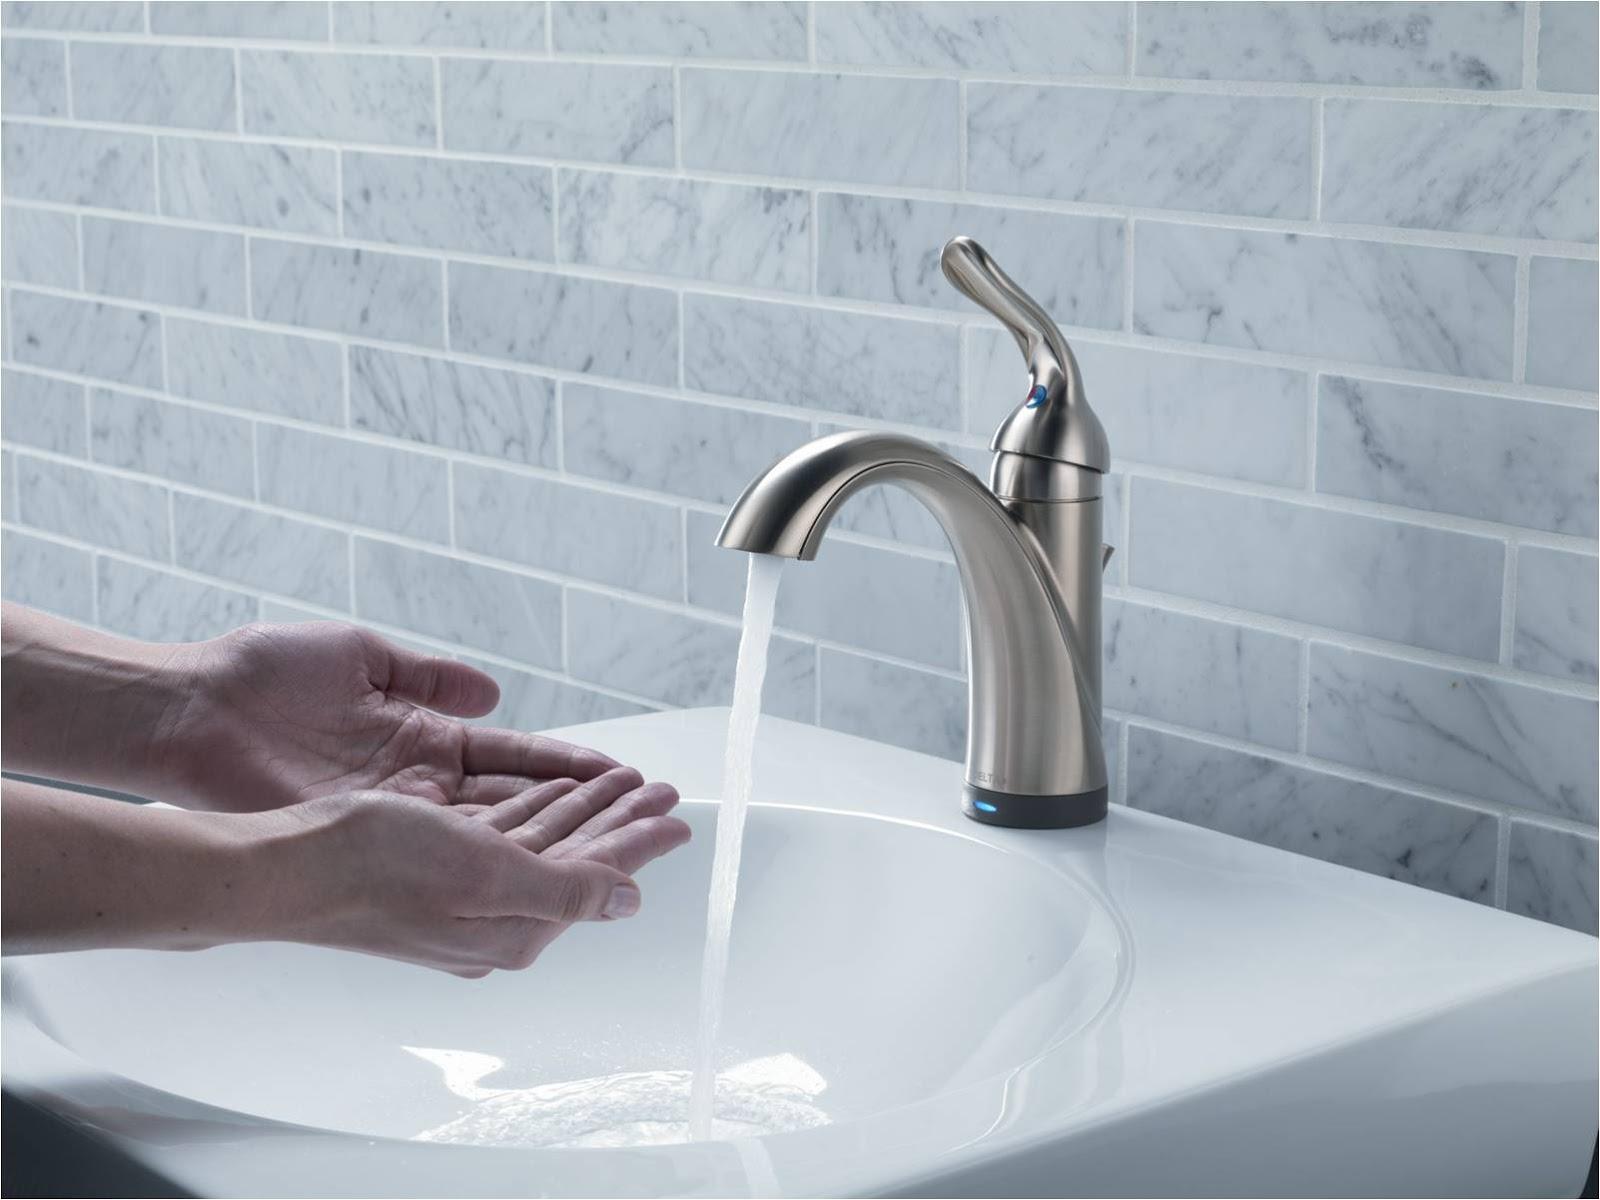 5 liter water per dag